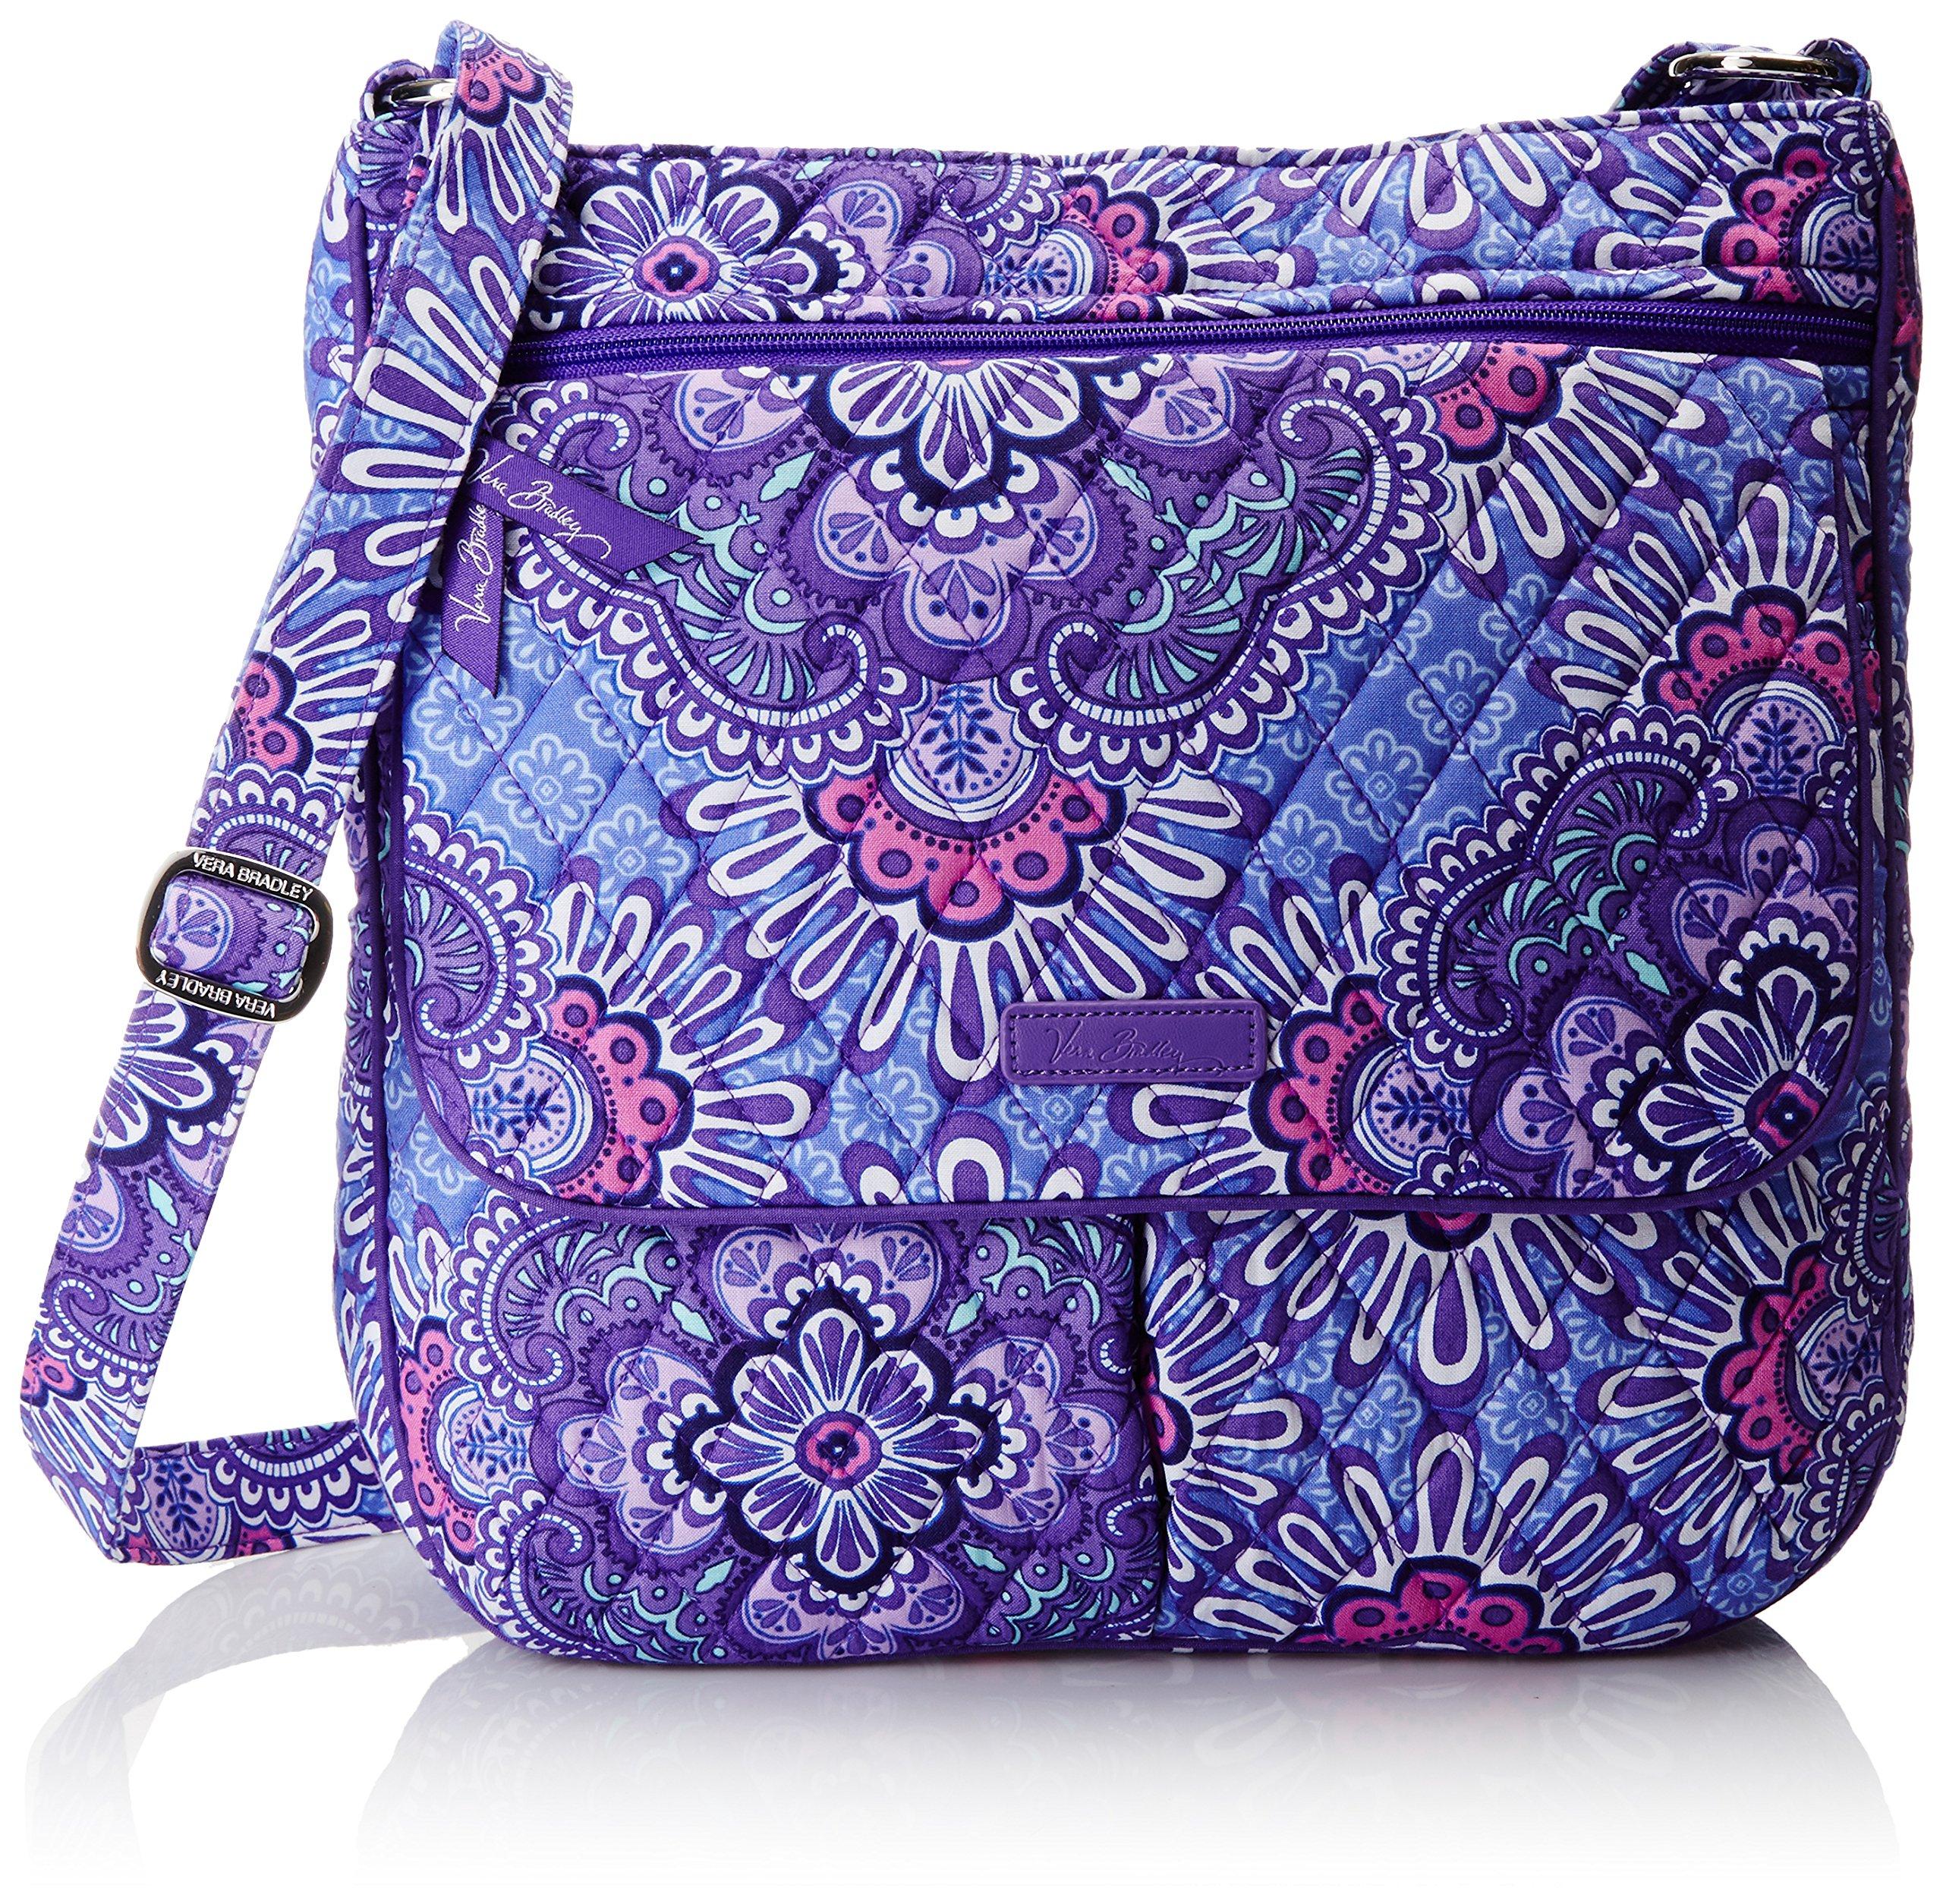 Vera Bradley Women's Double Zip Mailbag, Lilac Tapestry